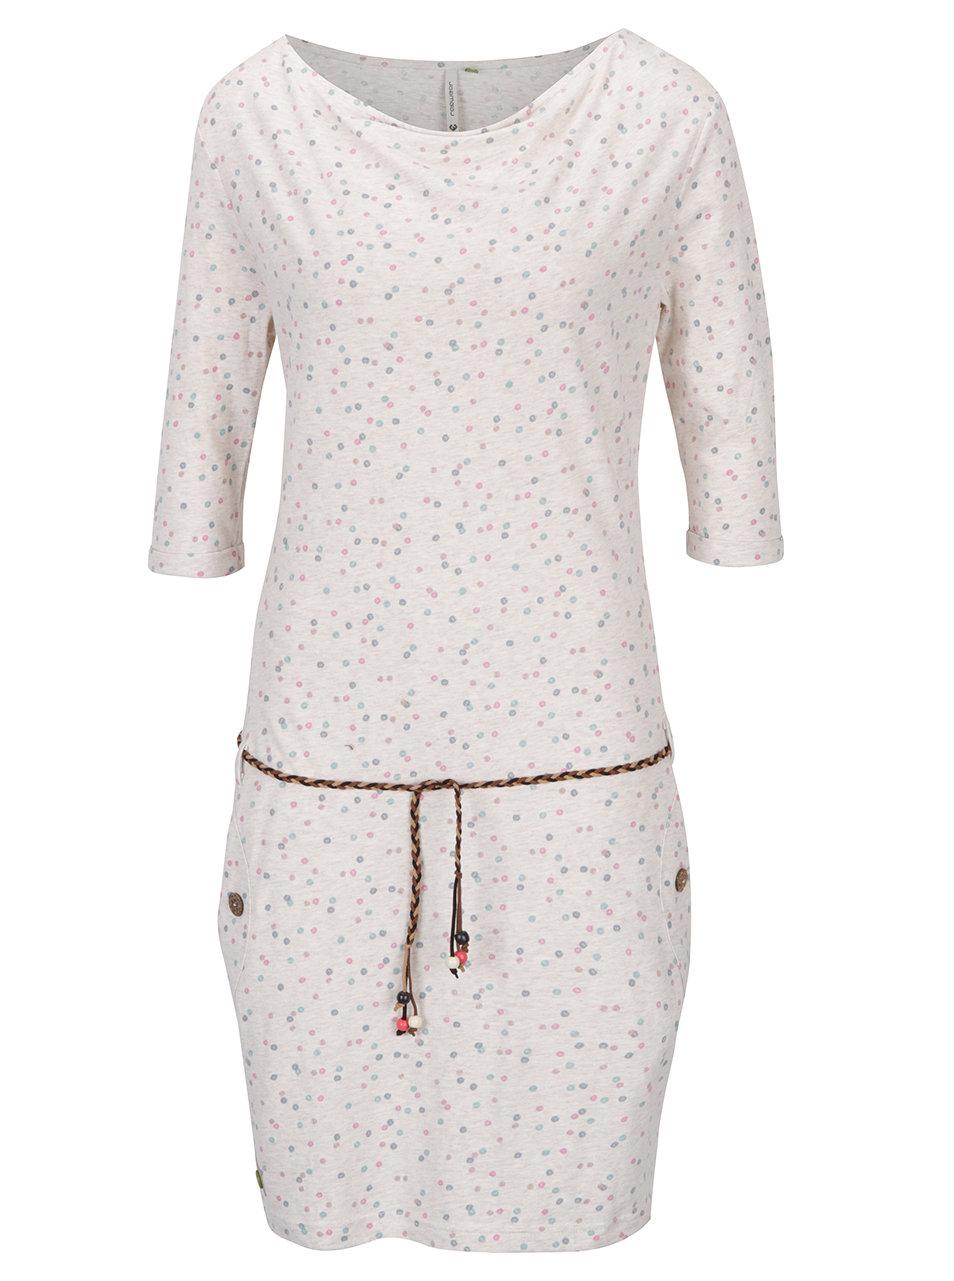 085c052f7 Béžové bodkované šaty s 3/4 rukávom Ragwear Tanya Organic | ZOOT.sk